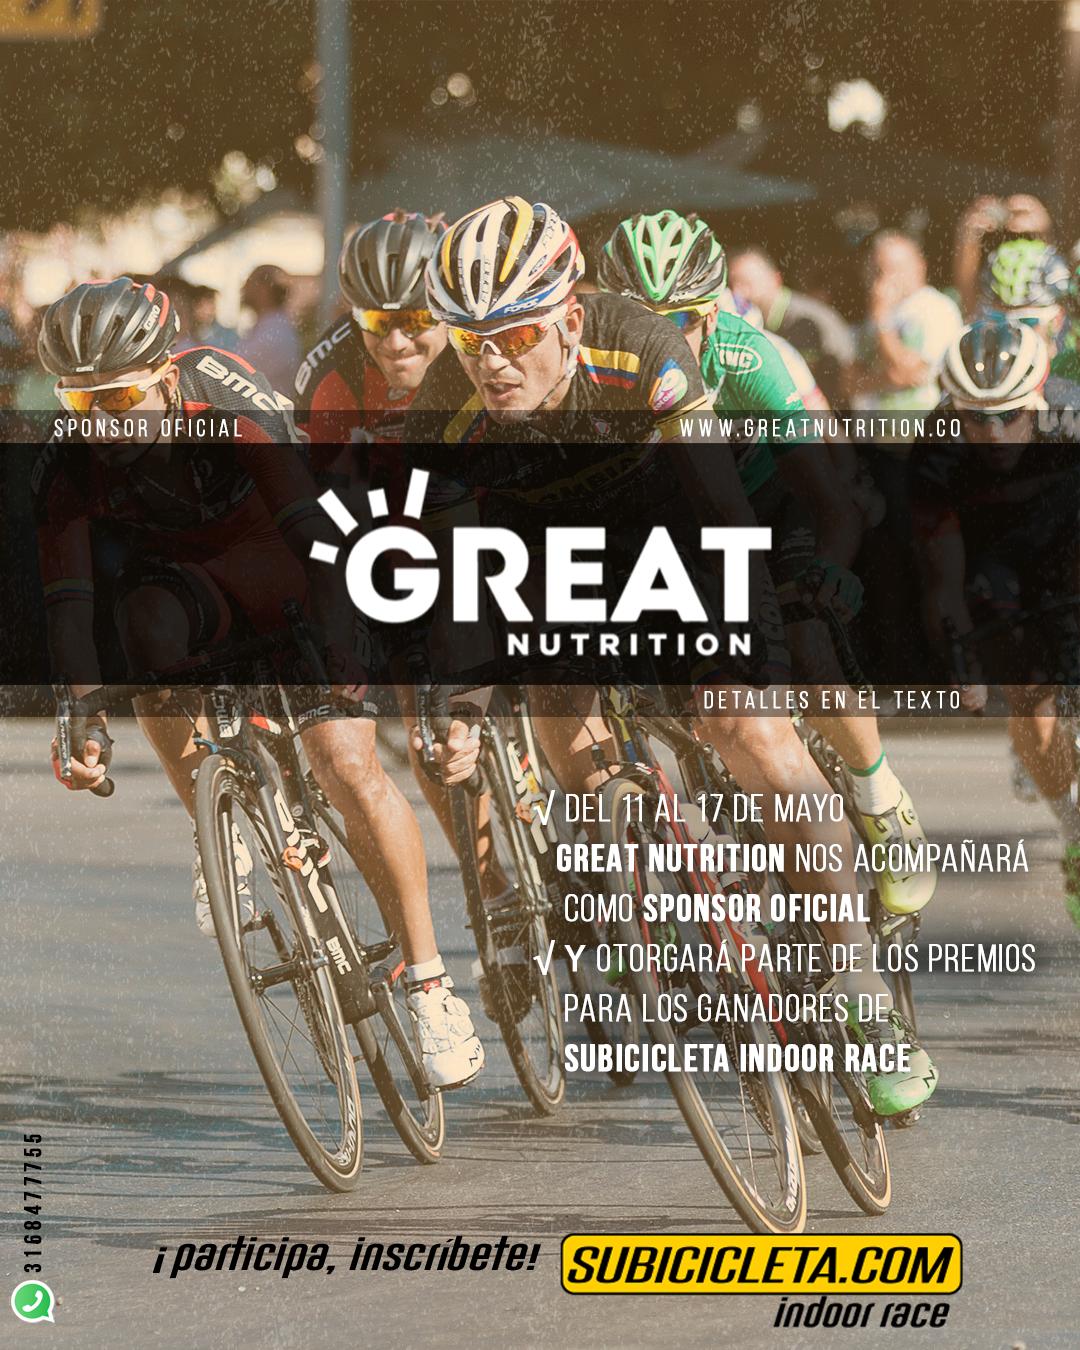 Great nutrition subicicleta indoor race 1